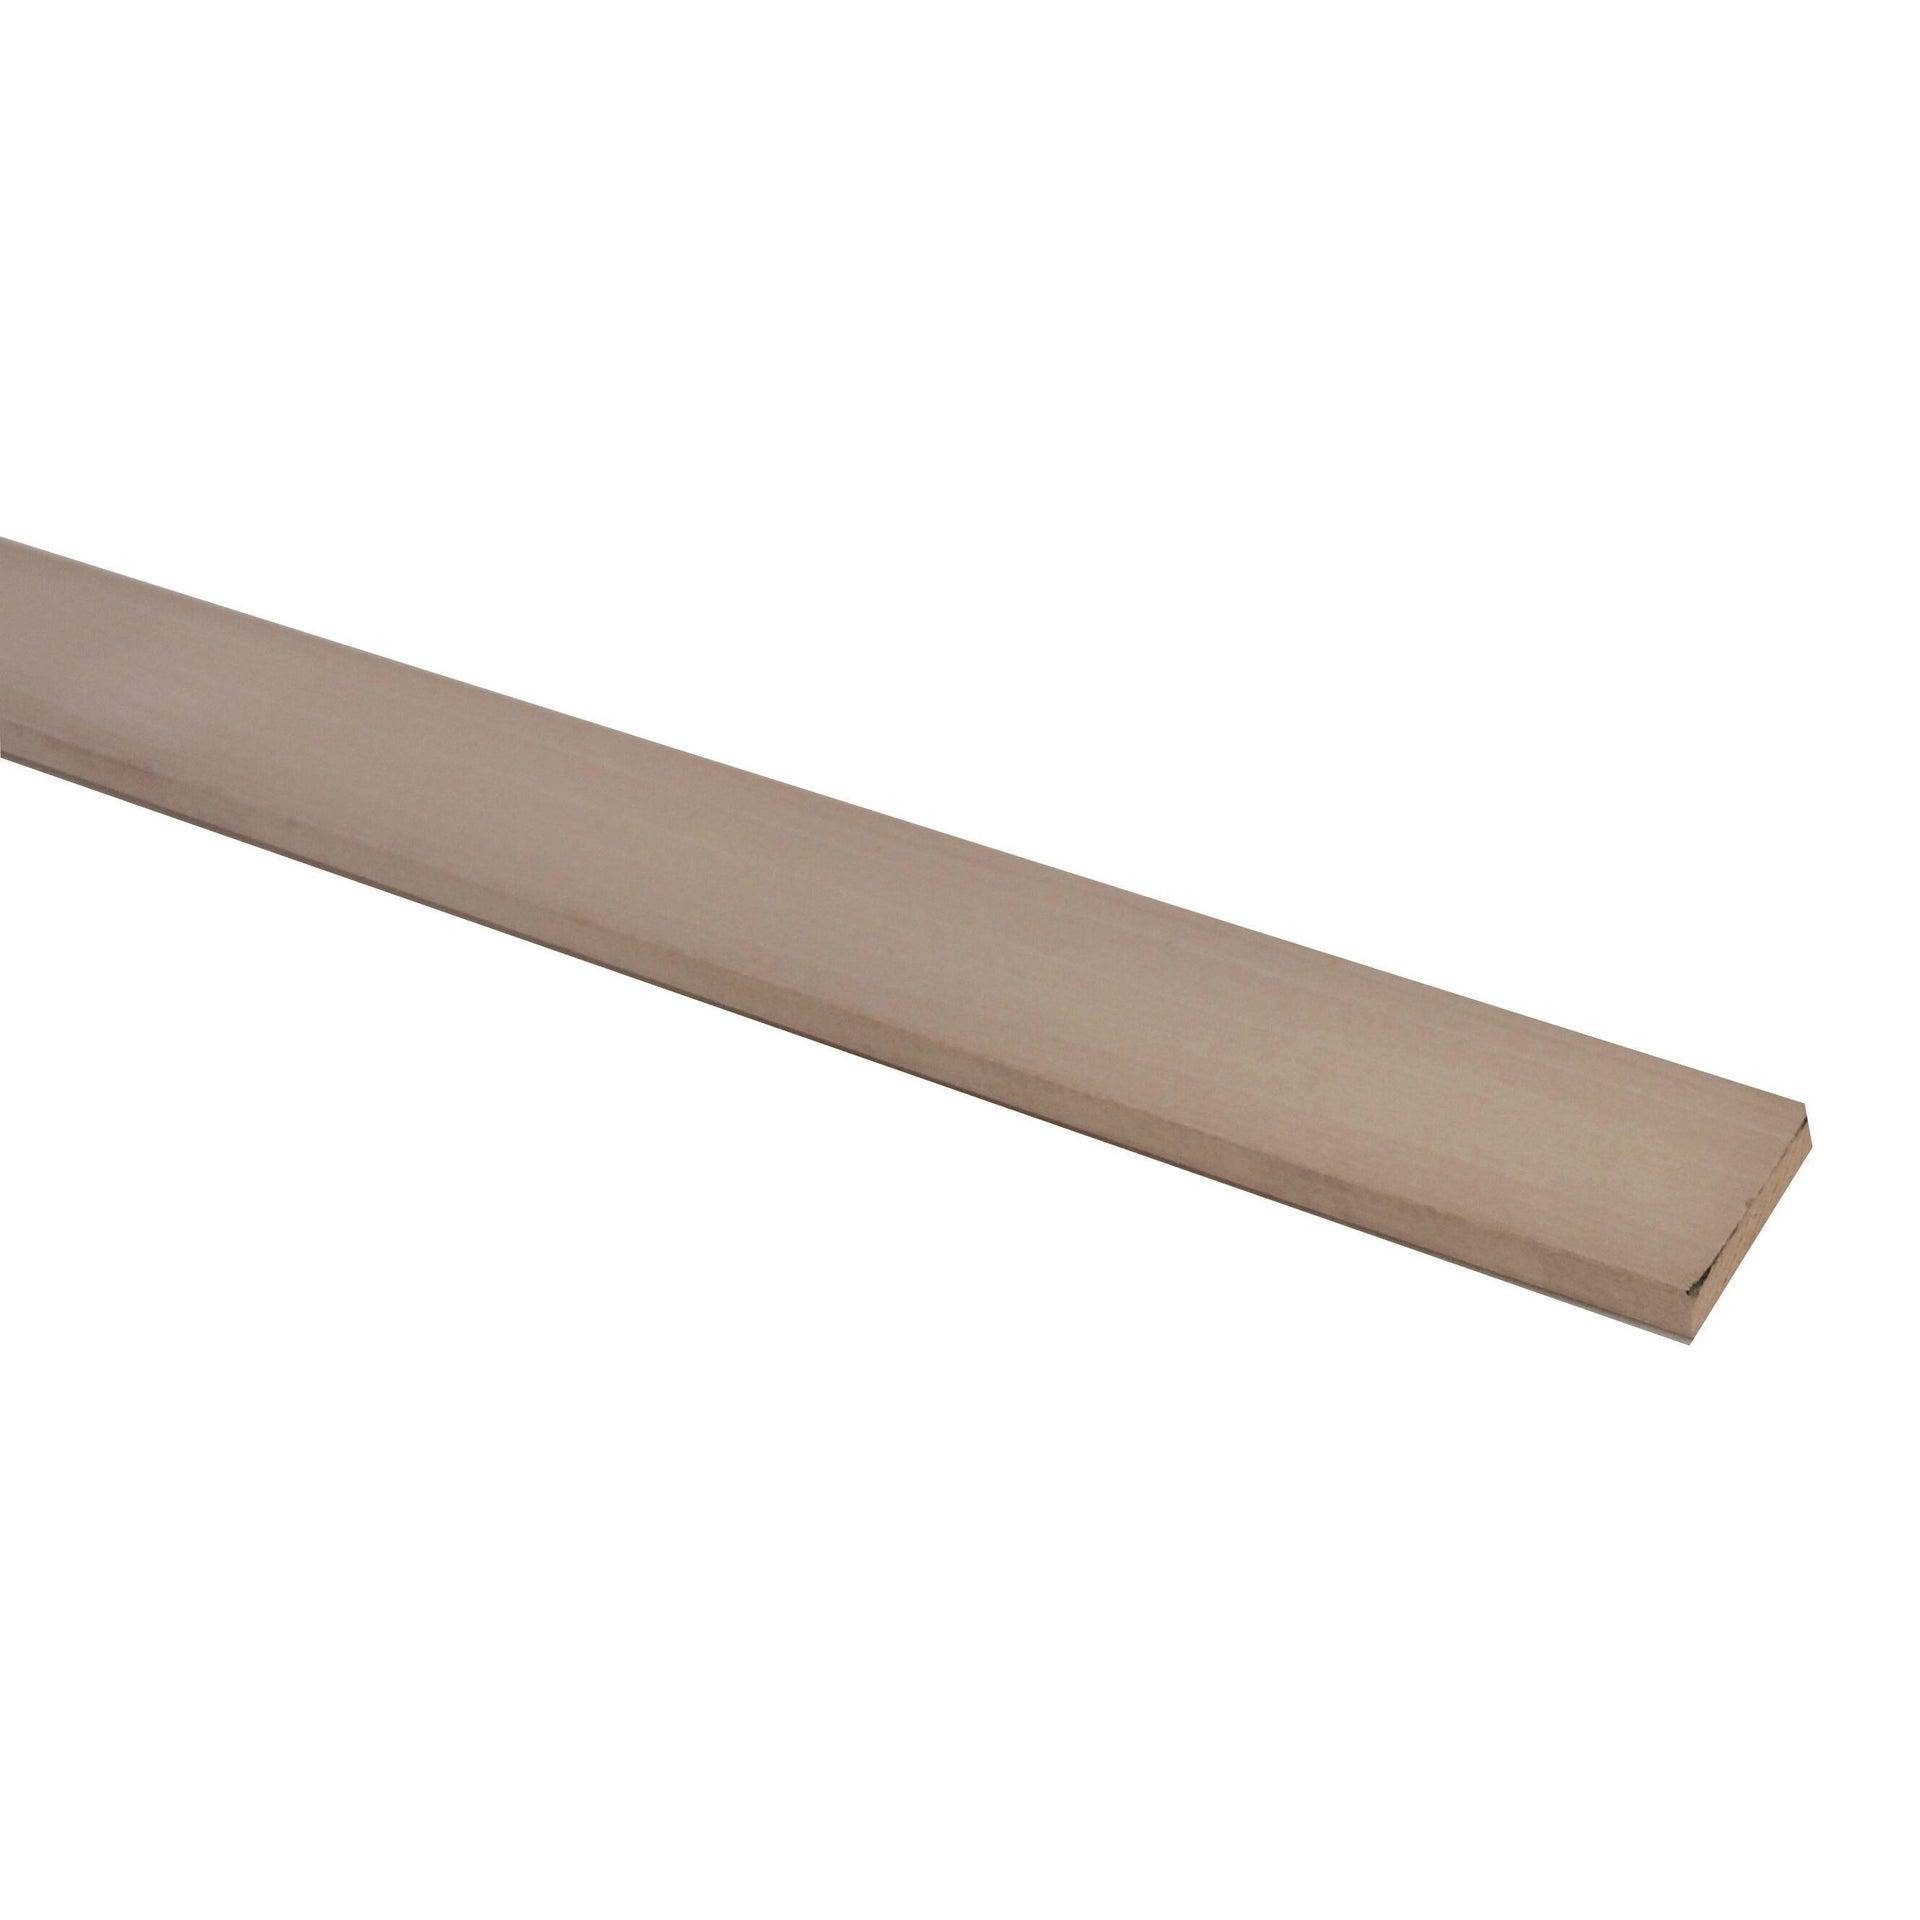 Listello piallato ayous 1 m x 40 mm, Sp 10 mm